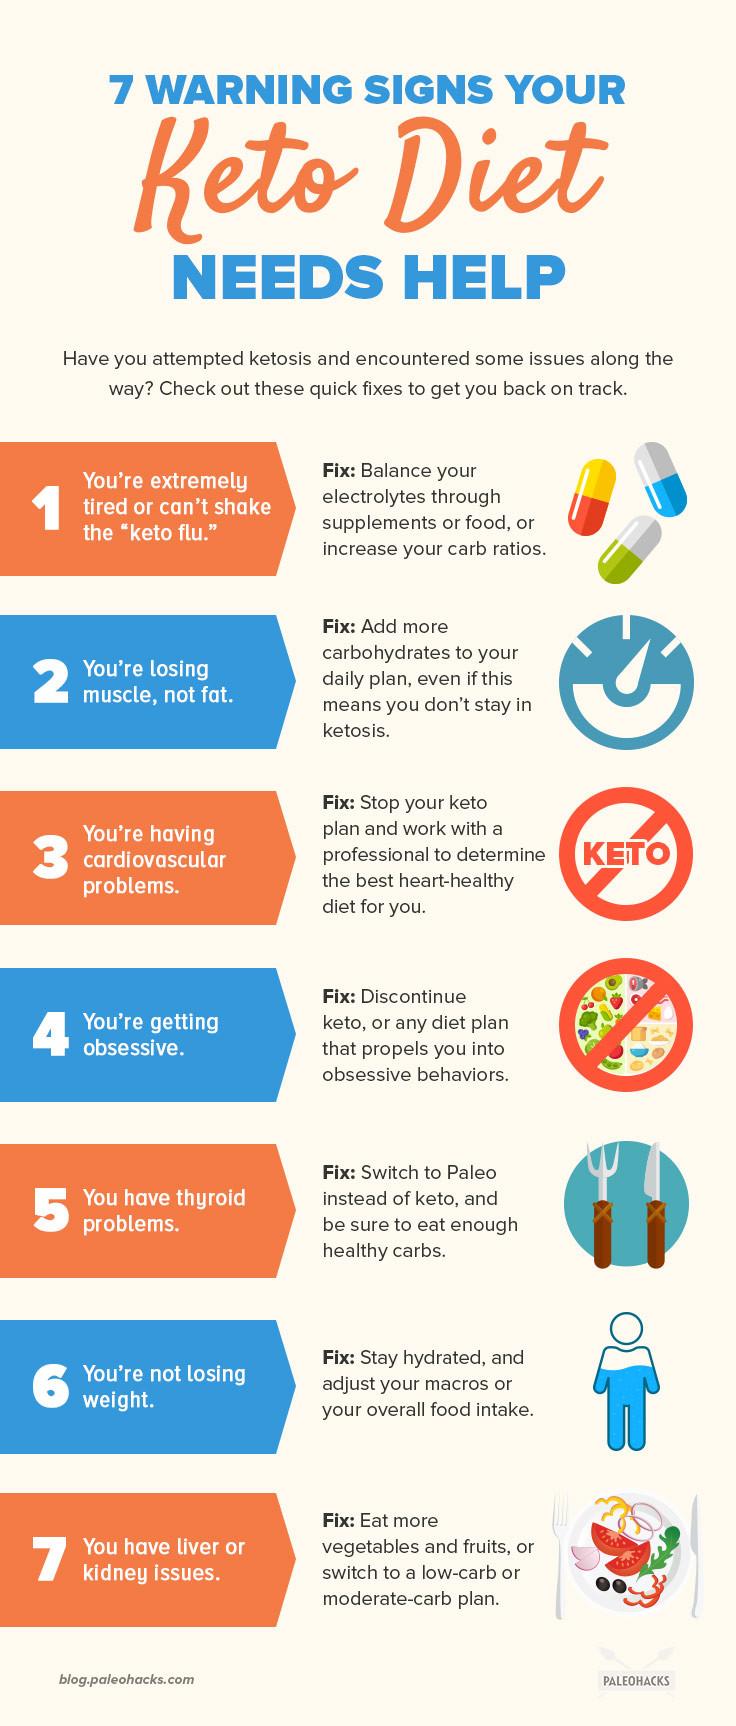 Symptoms Of Ketosis Diet  7 Warning Signs Your Keto Diet Needs Help